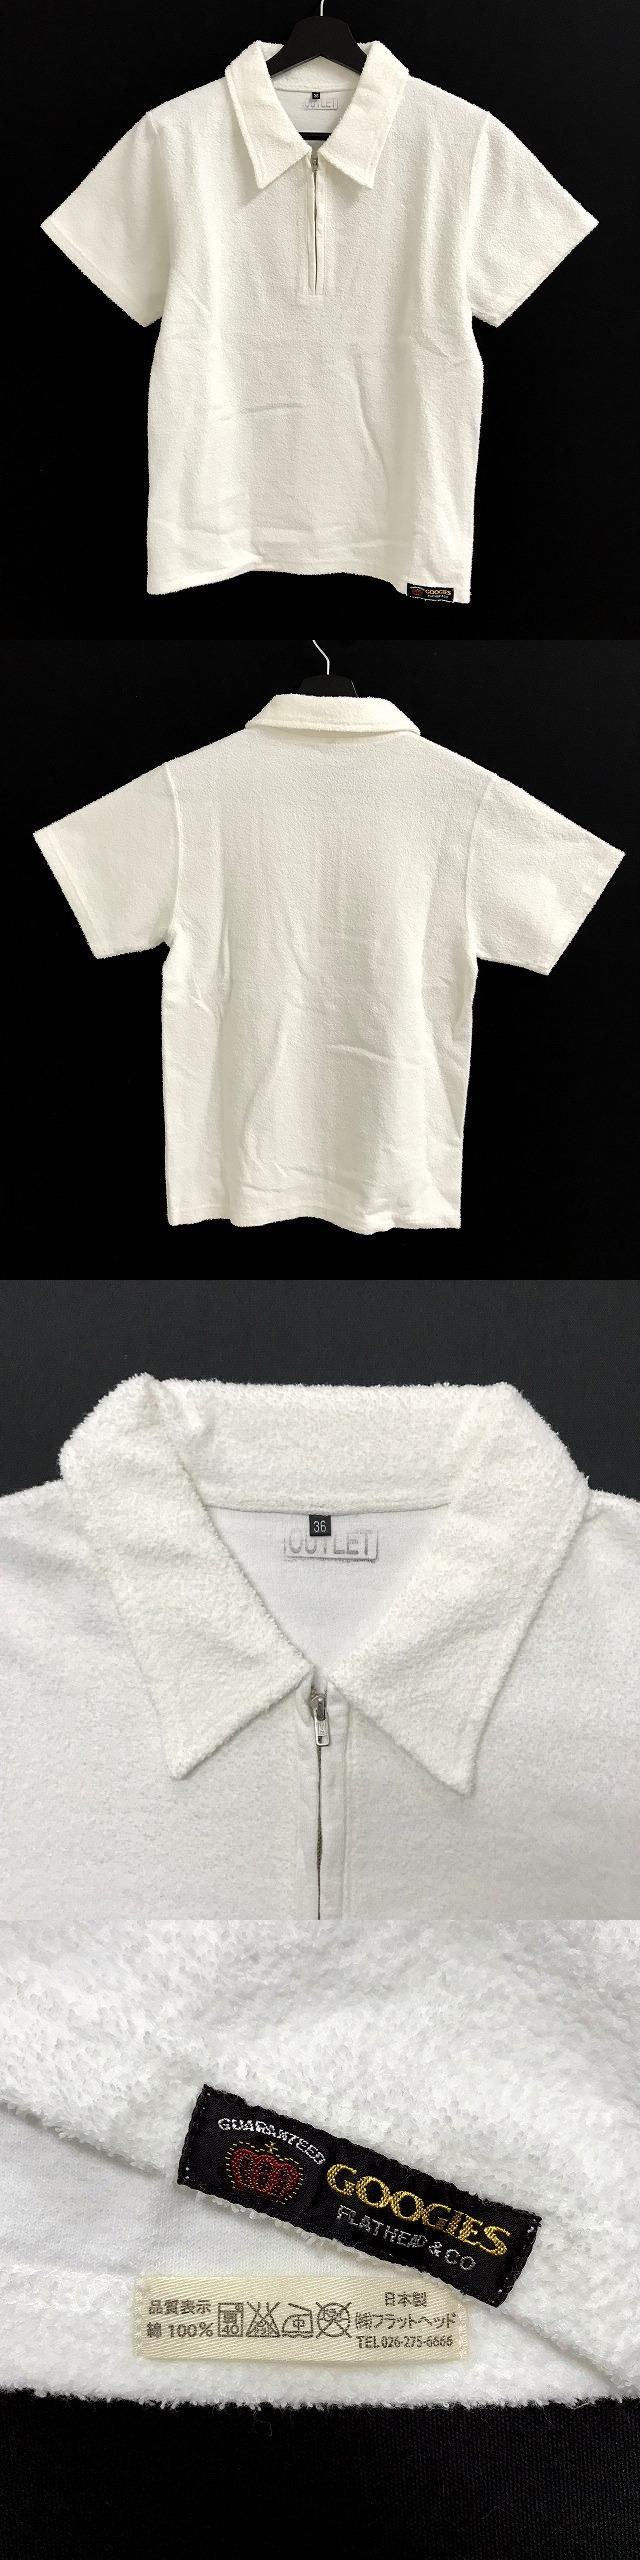 GOOGIES ハーフジップ プルオーバー パイル カットソー ポロシャツ 半袖 ホワイト 白 36